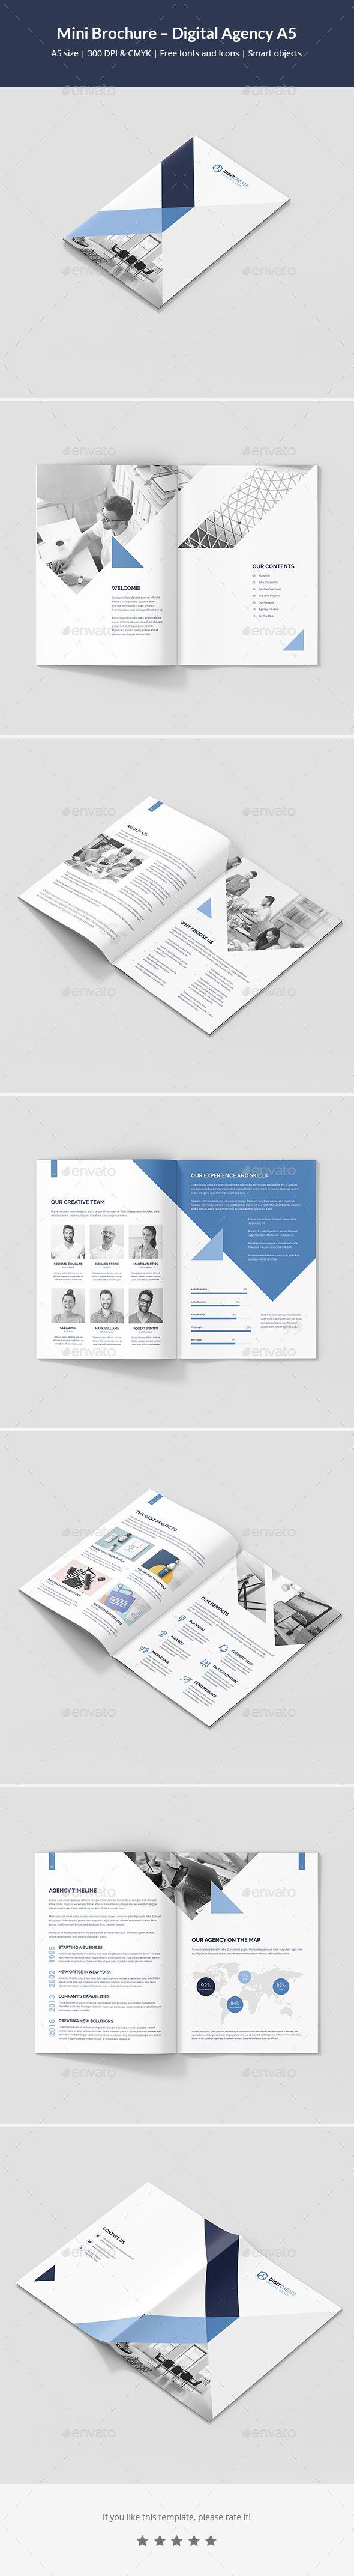 Mini Brochure Digital Agency A5 Brochure Template Brochures And A5